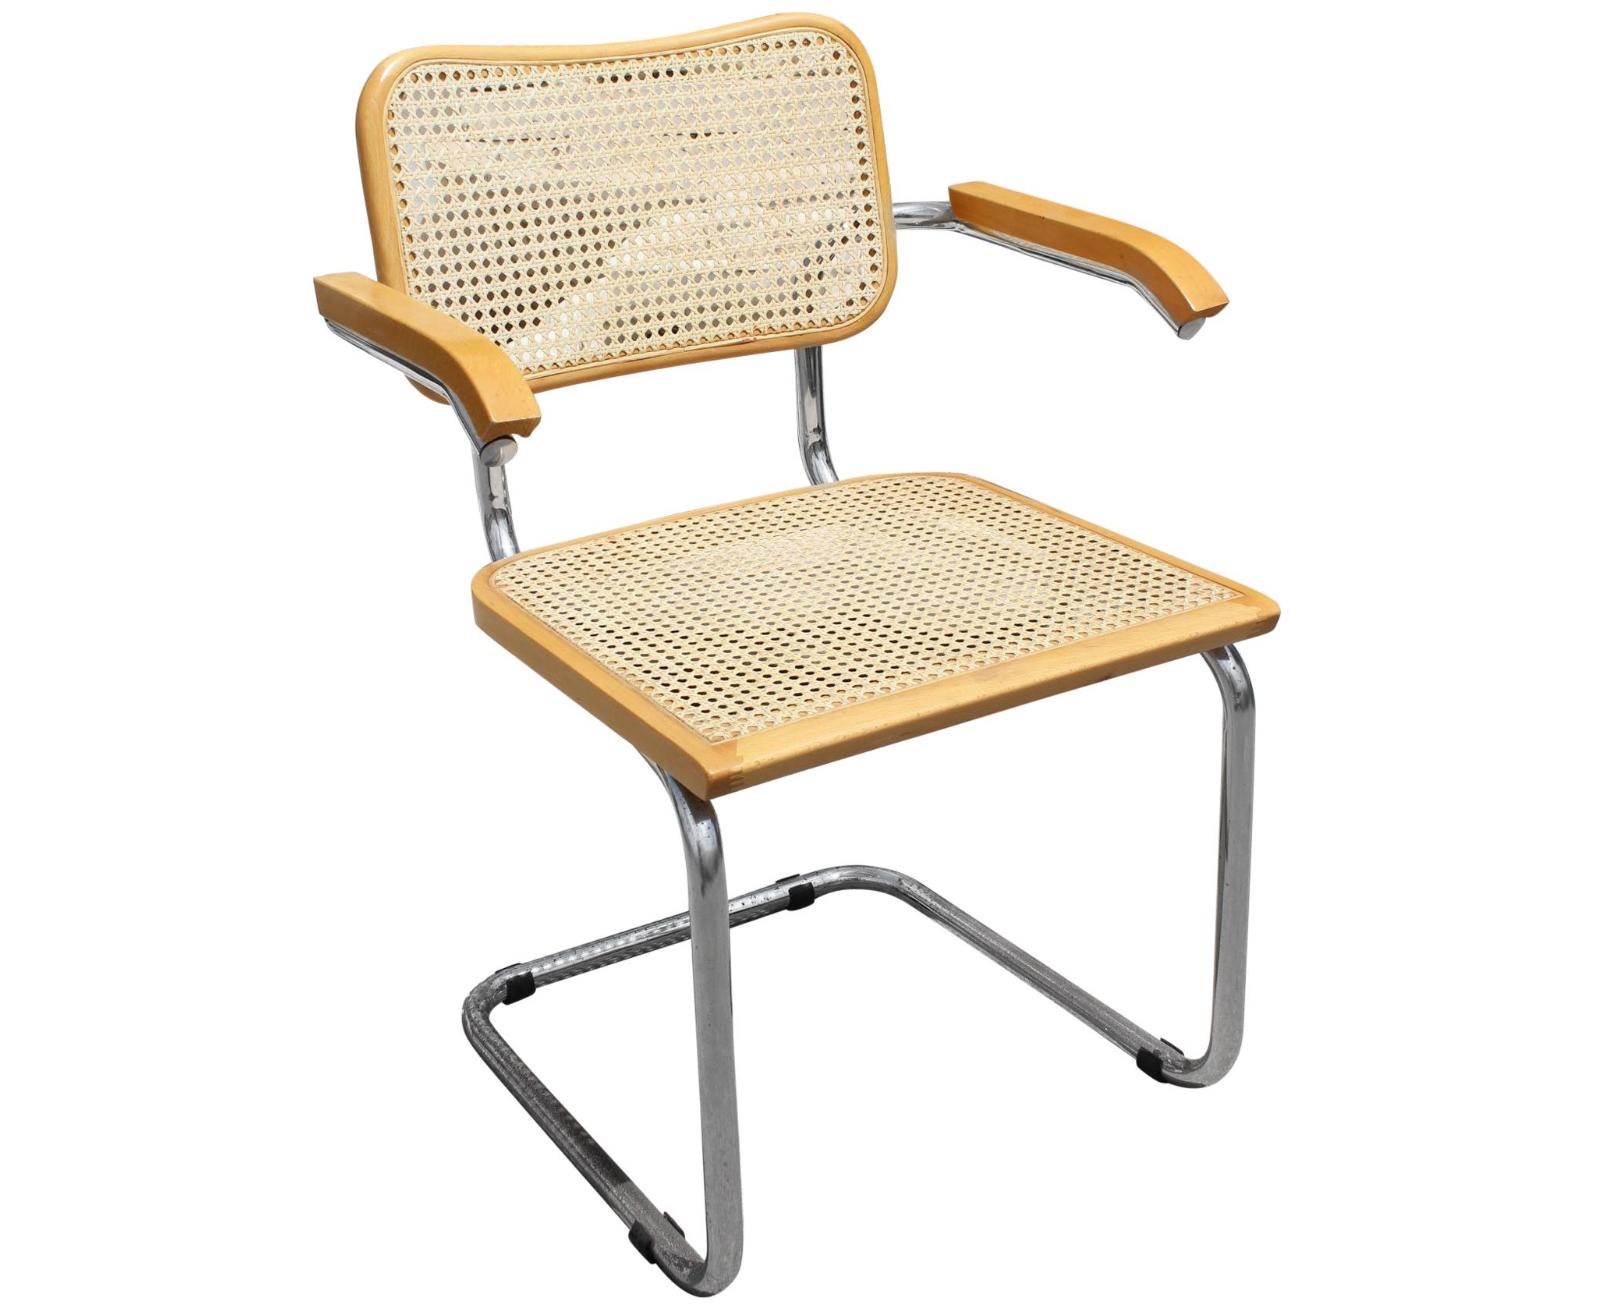 1970s Marcel Breuer Cane and Chrome Cesca Chair